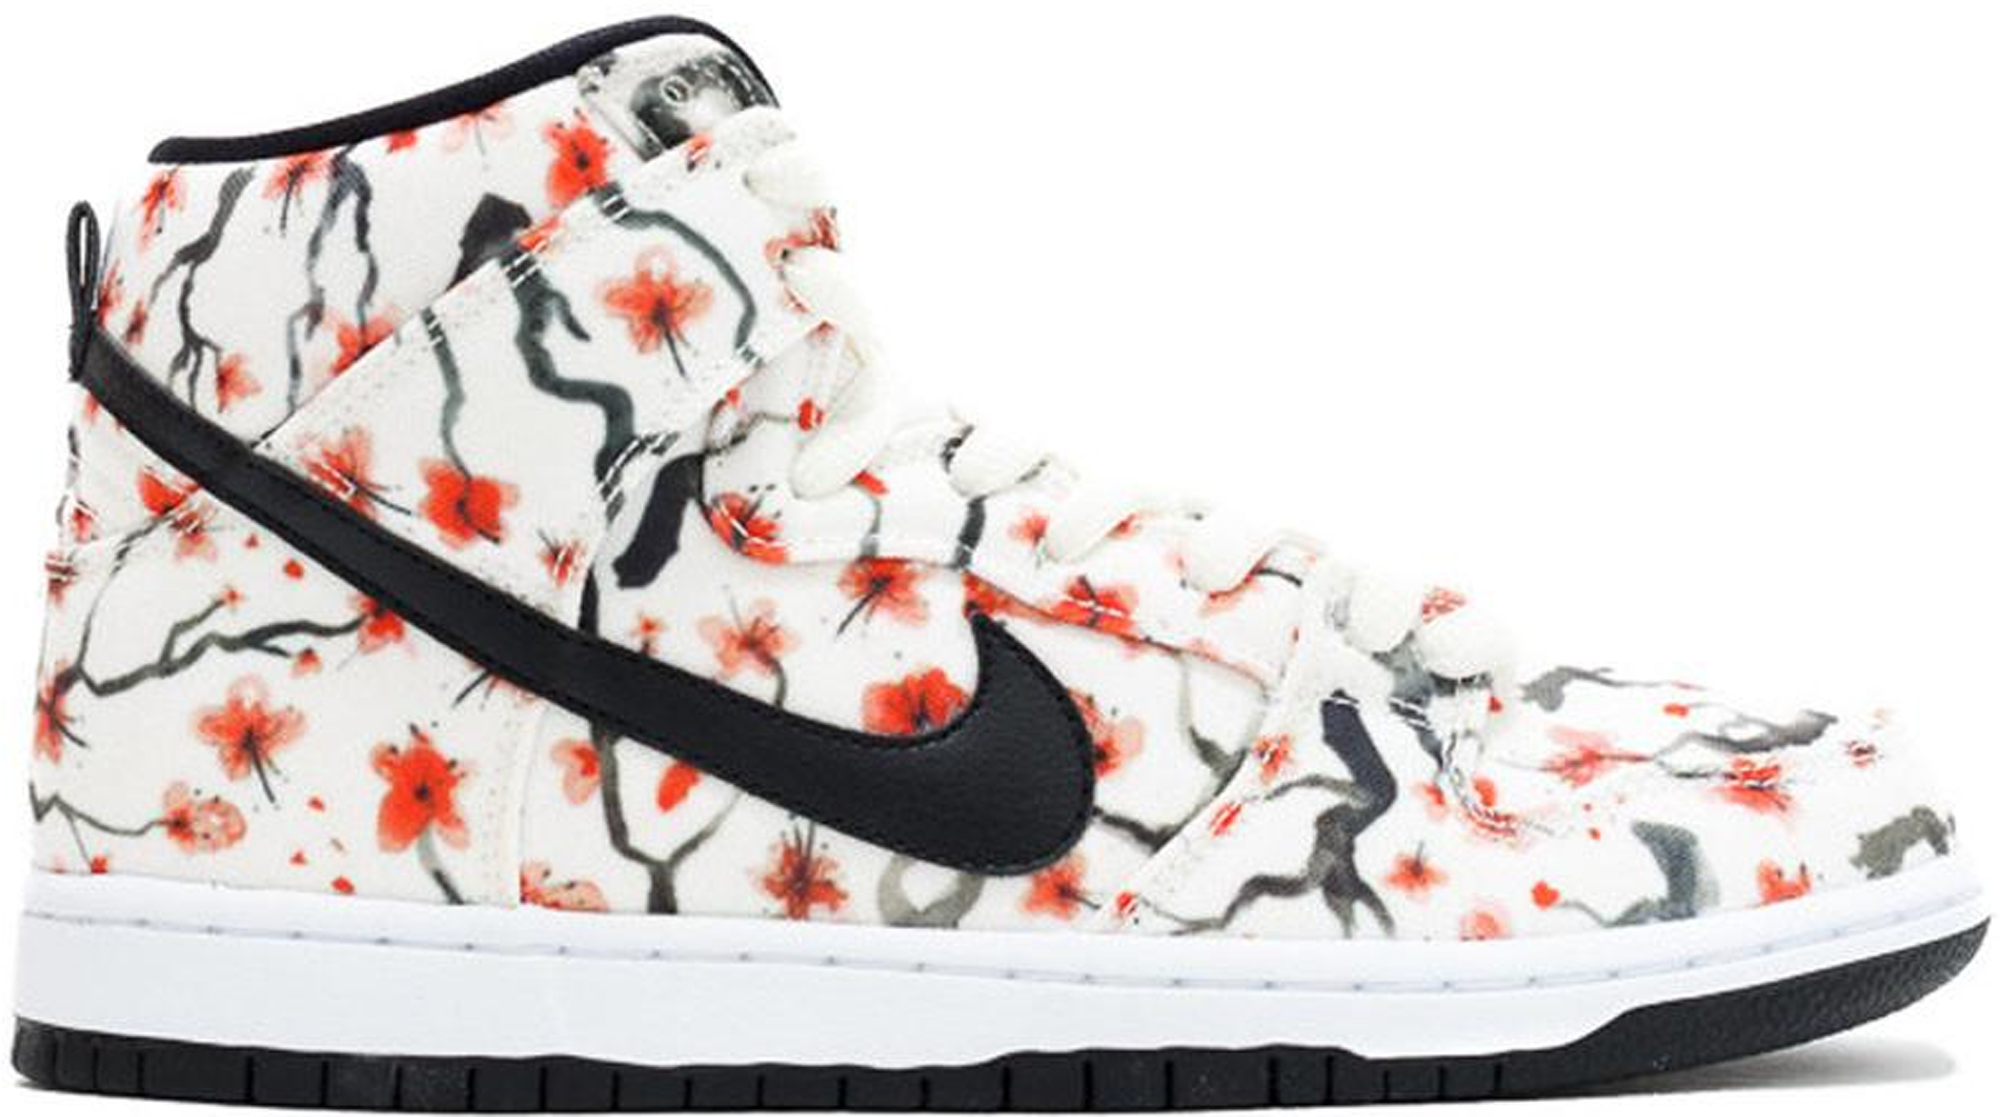 Nike SB Dunk High Cherry Blossom